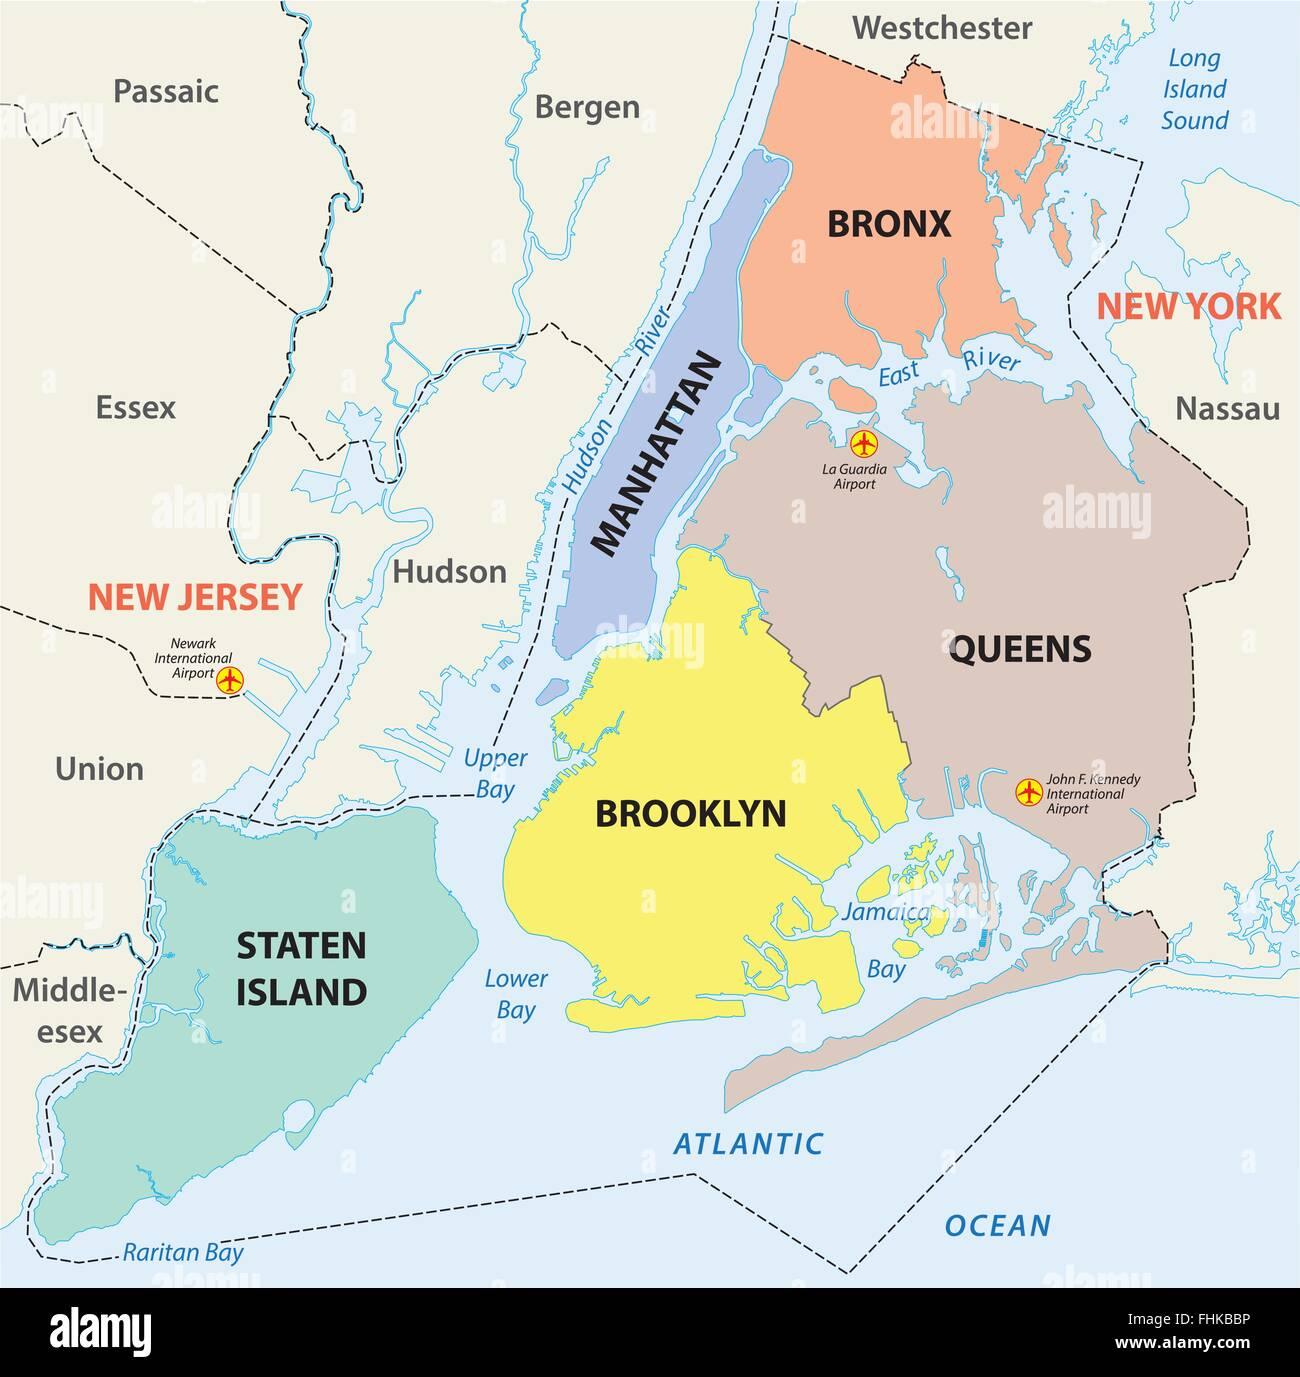 Stadtplan New York City 5 Bezirke Vektor Abbildung